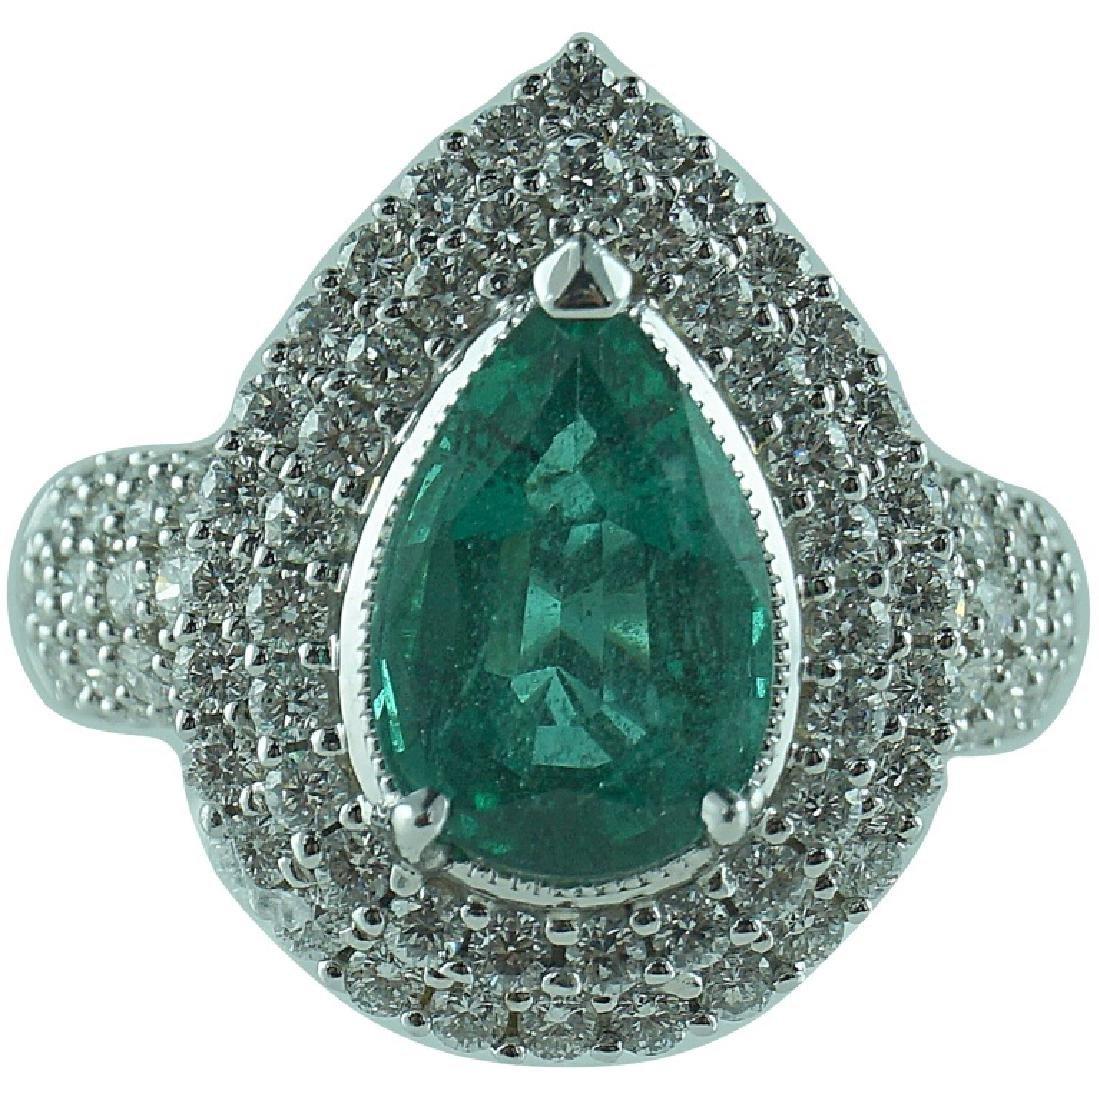 18 Karat WG 2.72 Carat Emerald 1.47 TCW Diamond